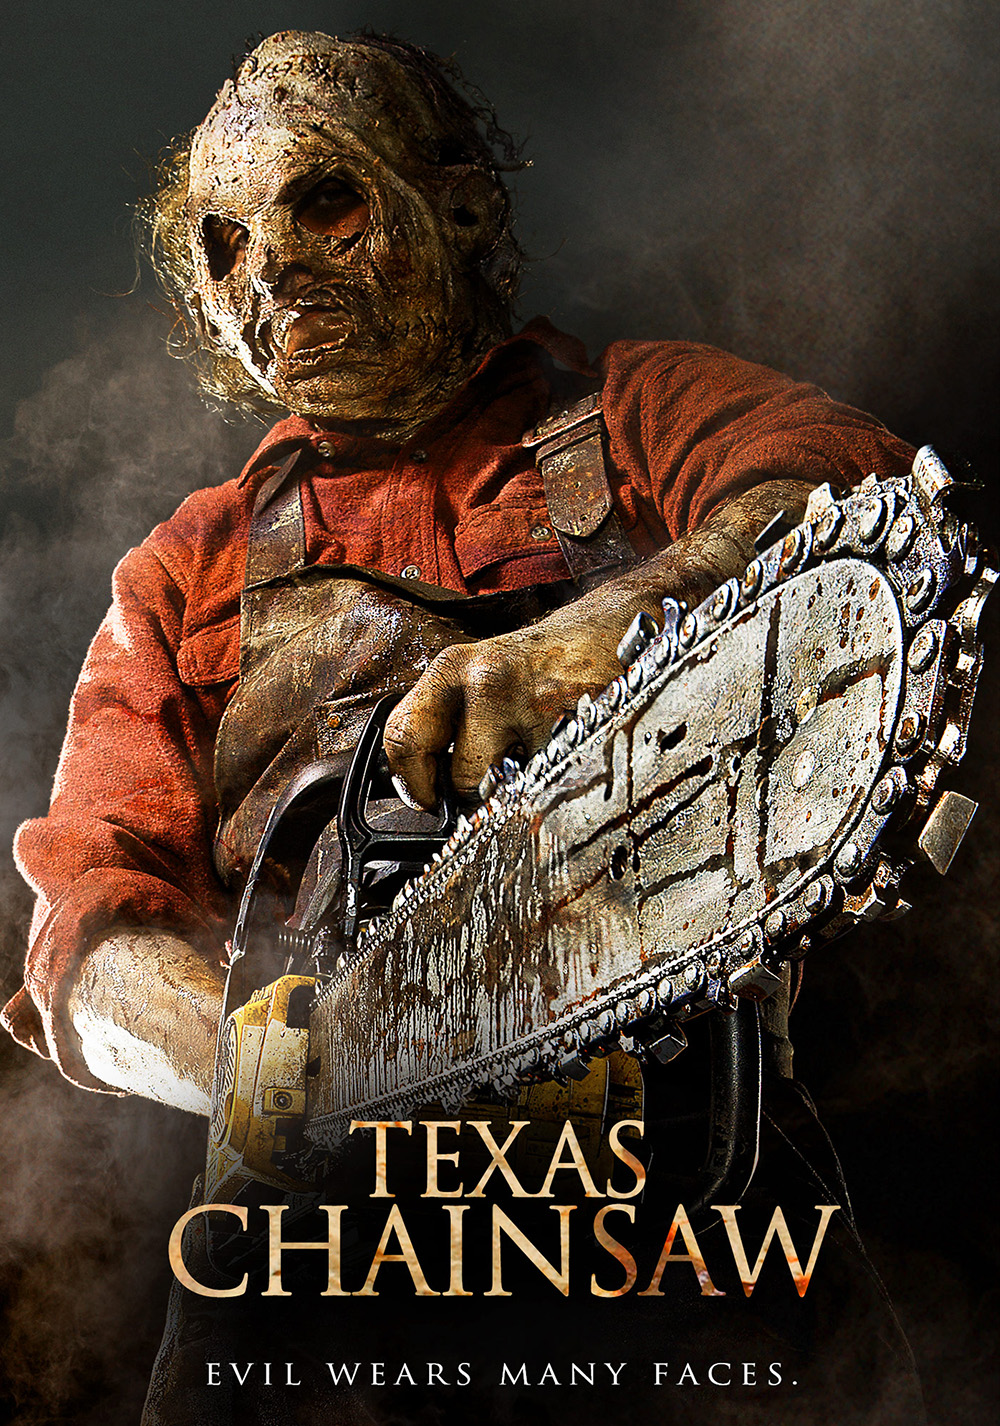 TEXAS CHAINSAW (2013) MOVIE TAMIL DUBBED HD